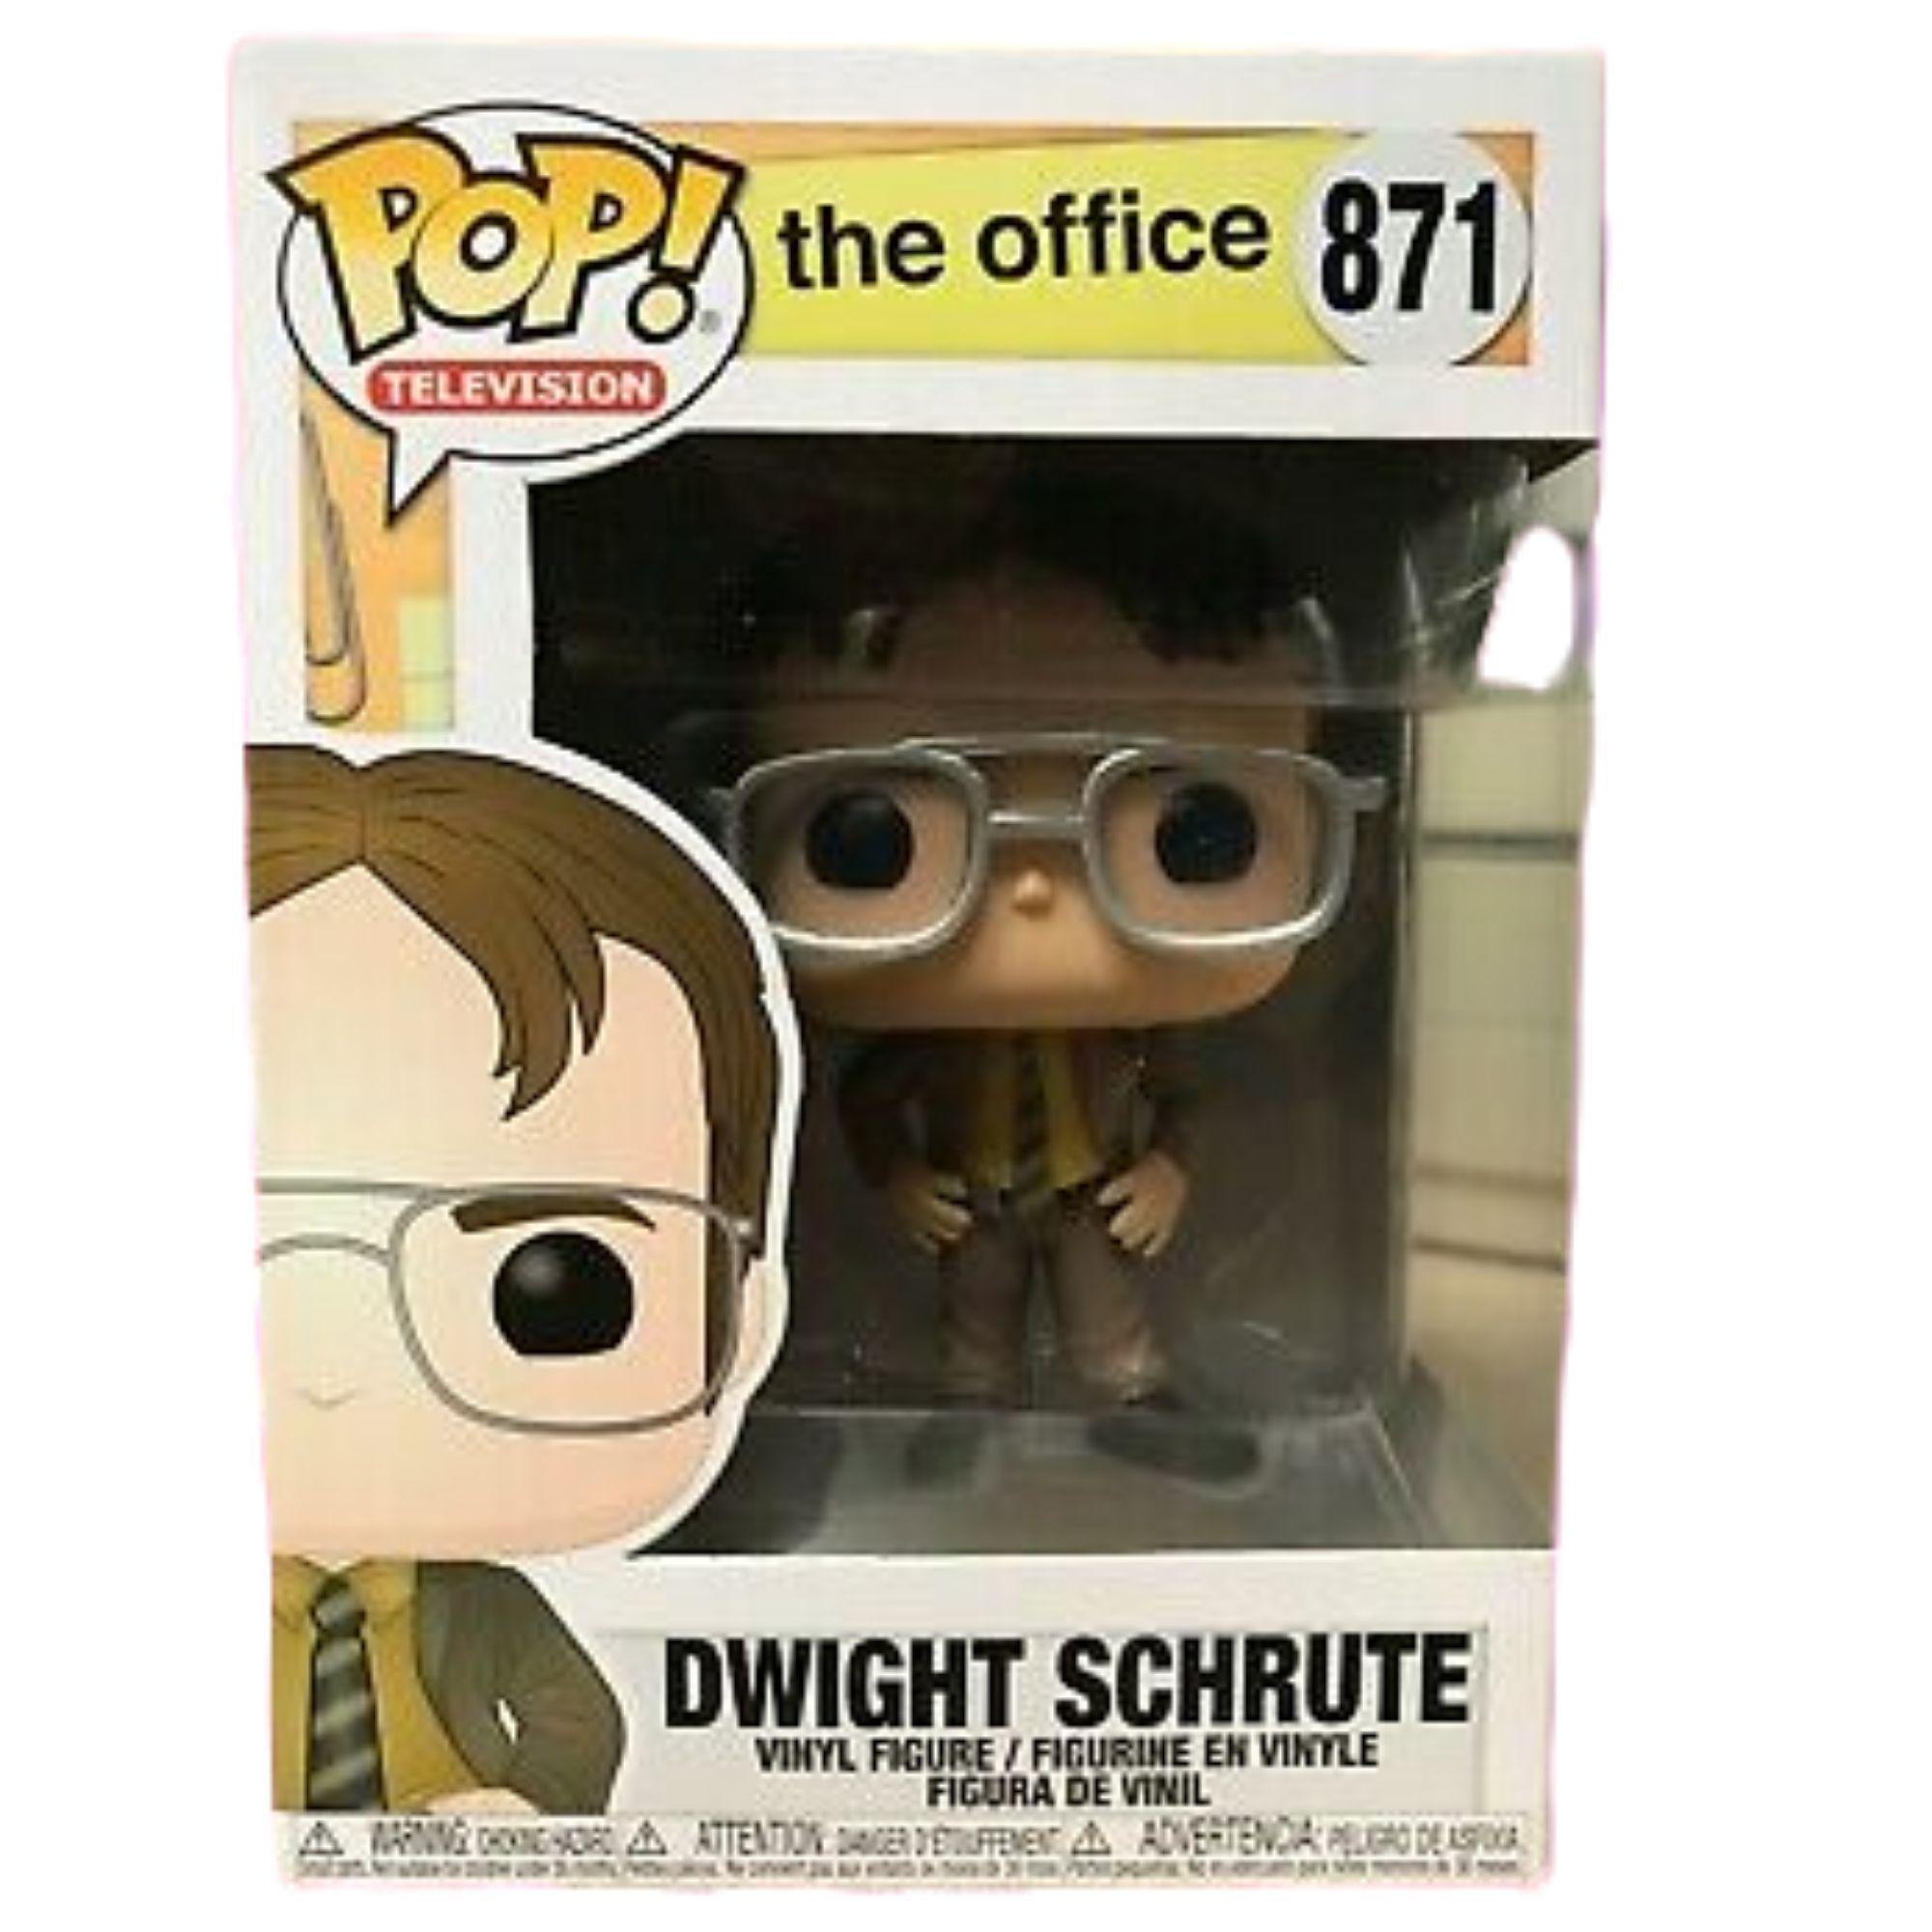 Boneco Funko Pop The Office Dwight Schrute #871  - Game Land Brinquedos